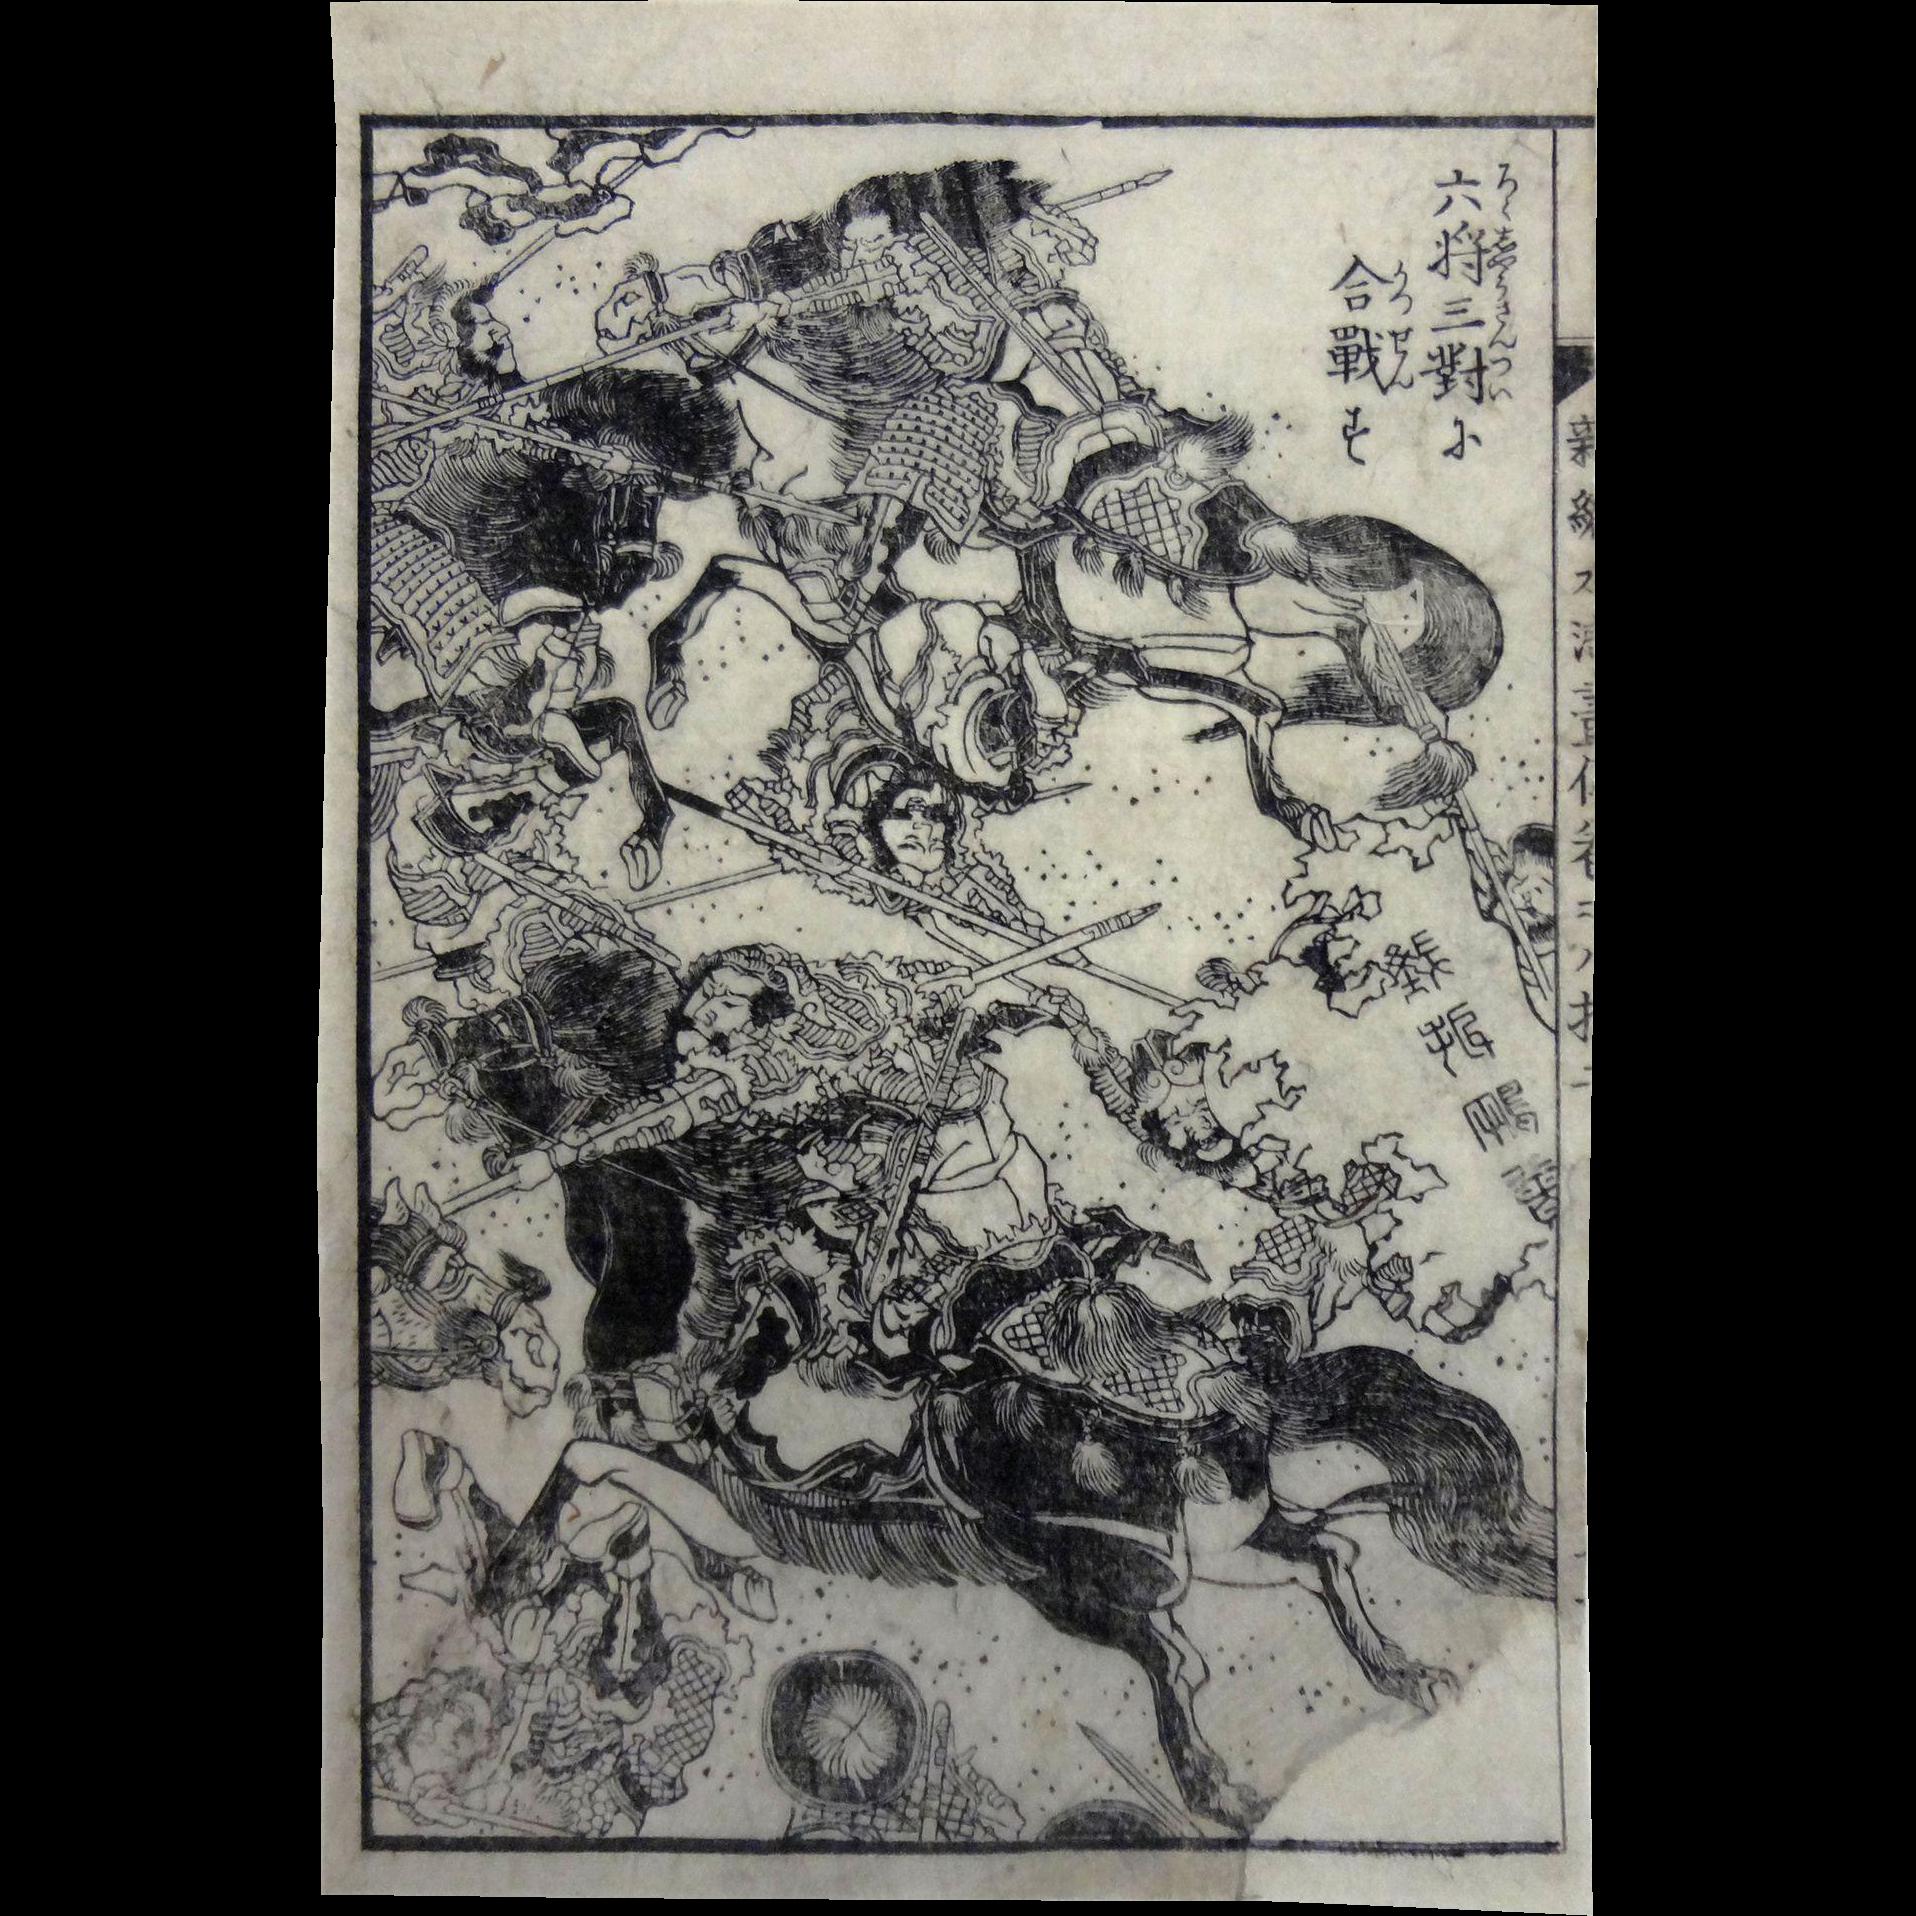 Antique Japanese Wooblock Print Warriors on Horseback Black White Framed Ehon Manga - 19th Century, Japan